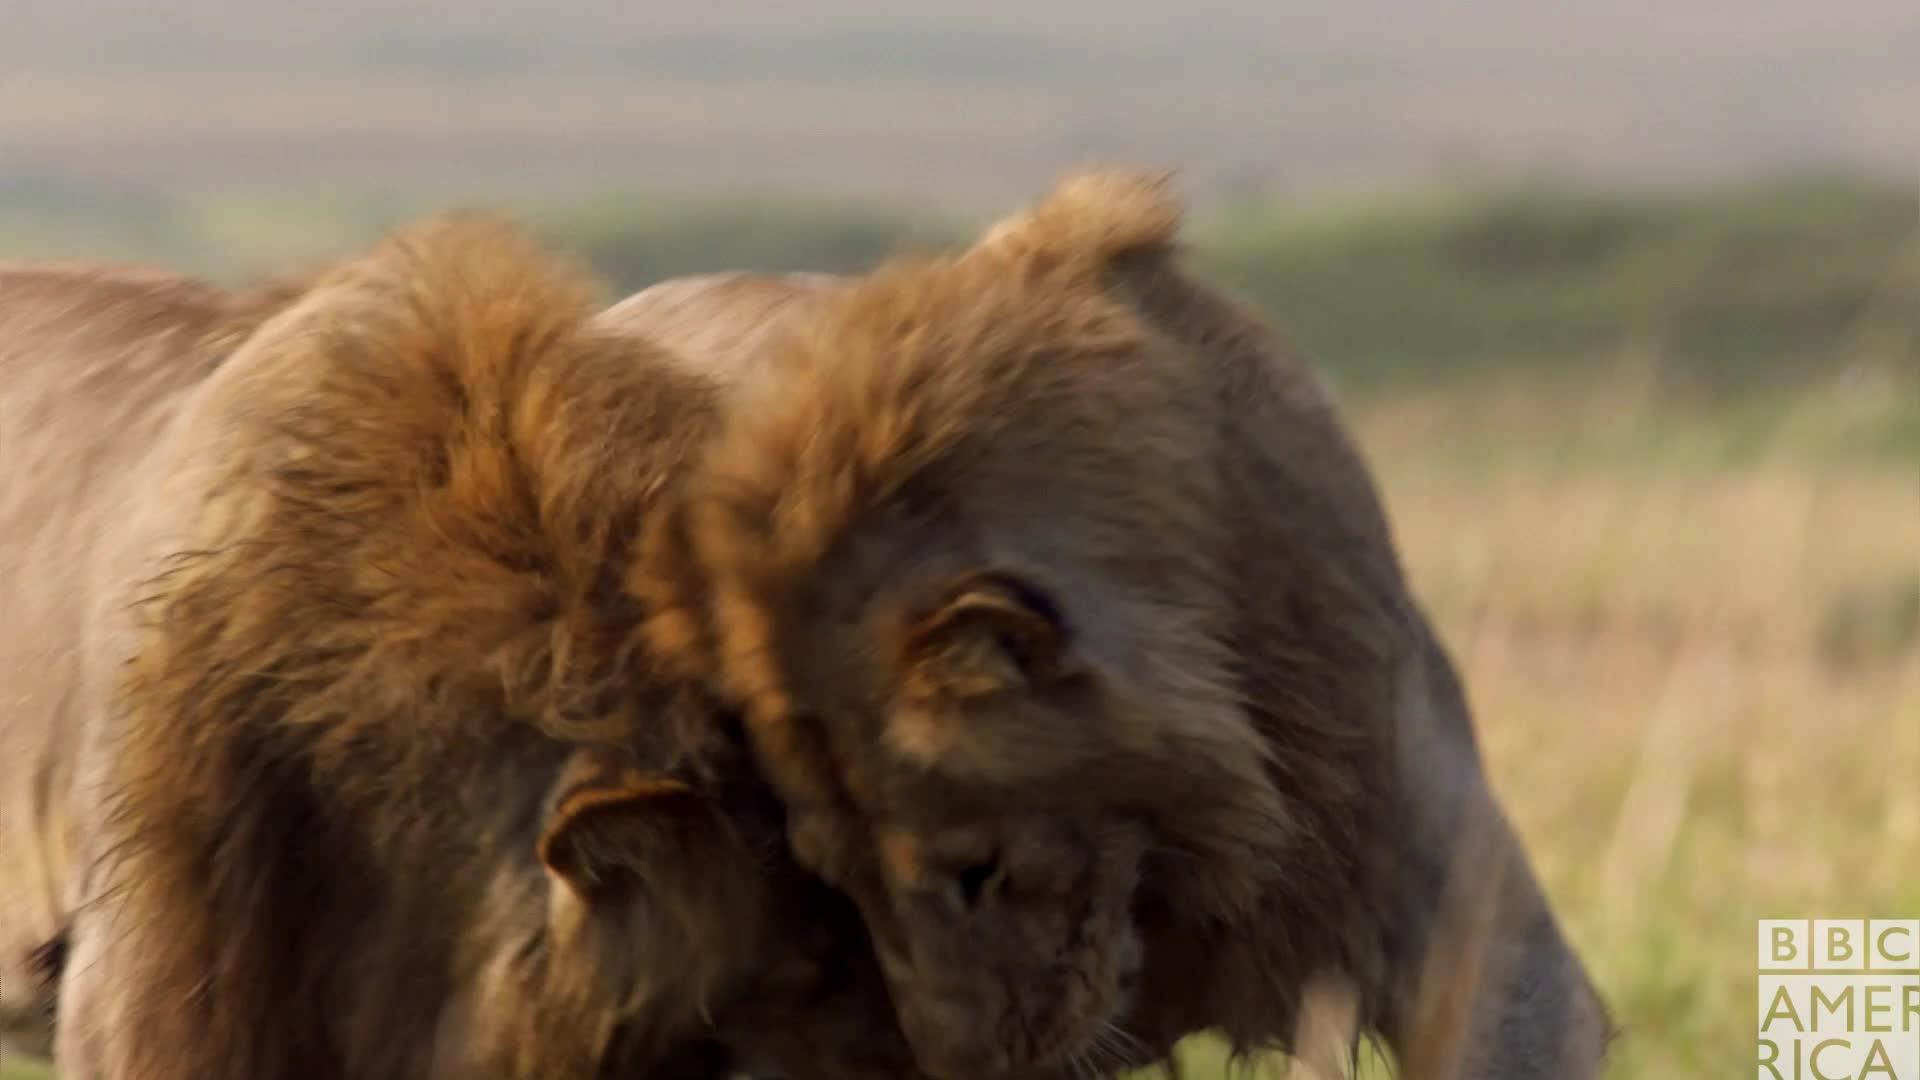 animal, animals, awww, bbc america, bbc america: dynasties, bro, cuddle, cuddles, dynasties, hug, hugs, lion, lions, love, snuggle, Dynasties Lion Bro Love GIFs